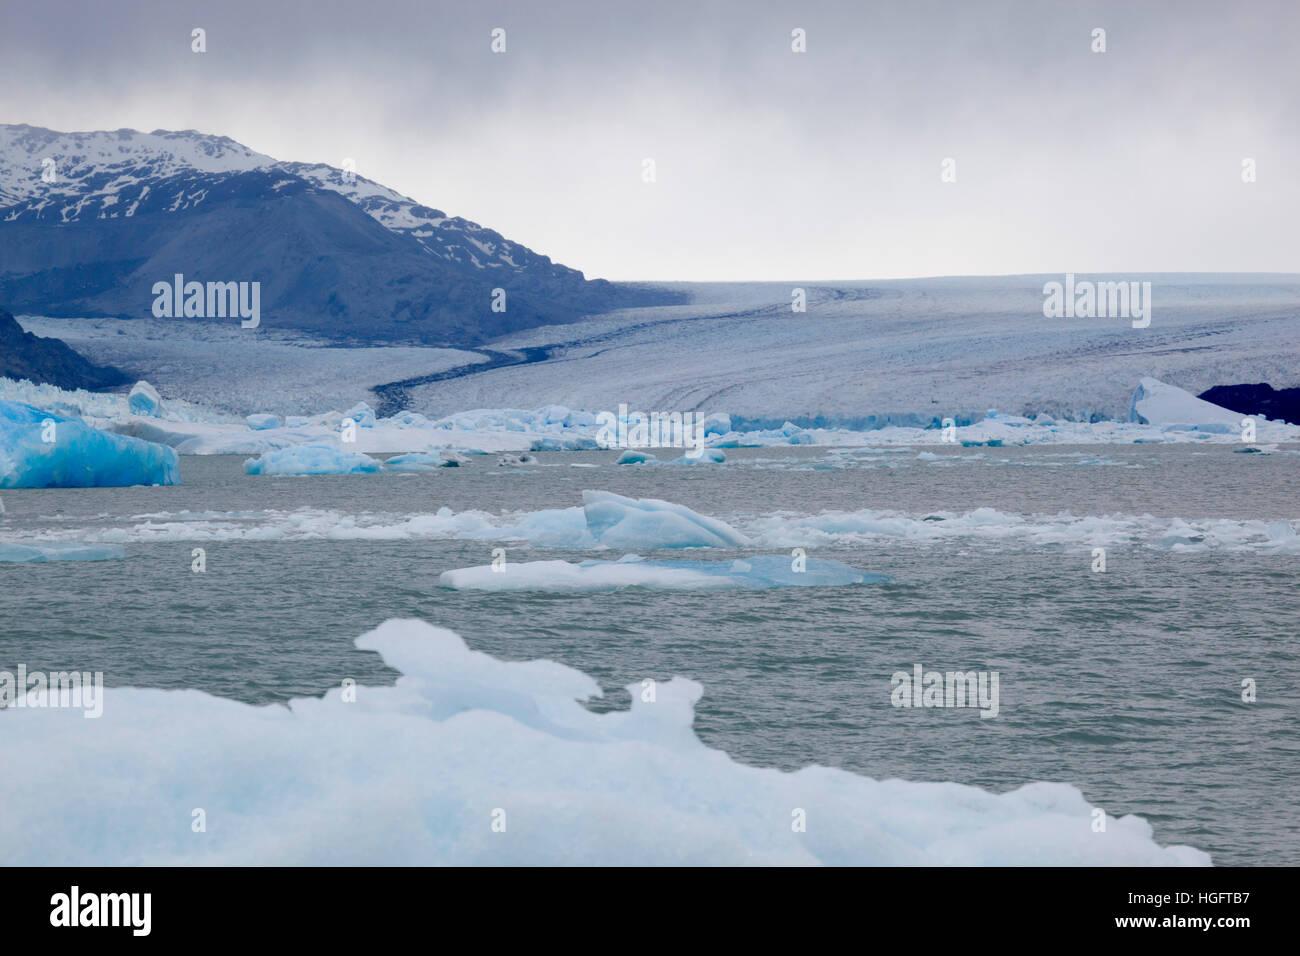 Glacier Upsala et des icebergs sur le lac Argentino, El Calafate, parc national Los Glaciares, Patagonie, Argentine, Photo Stock